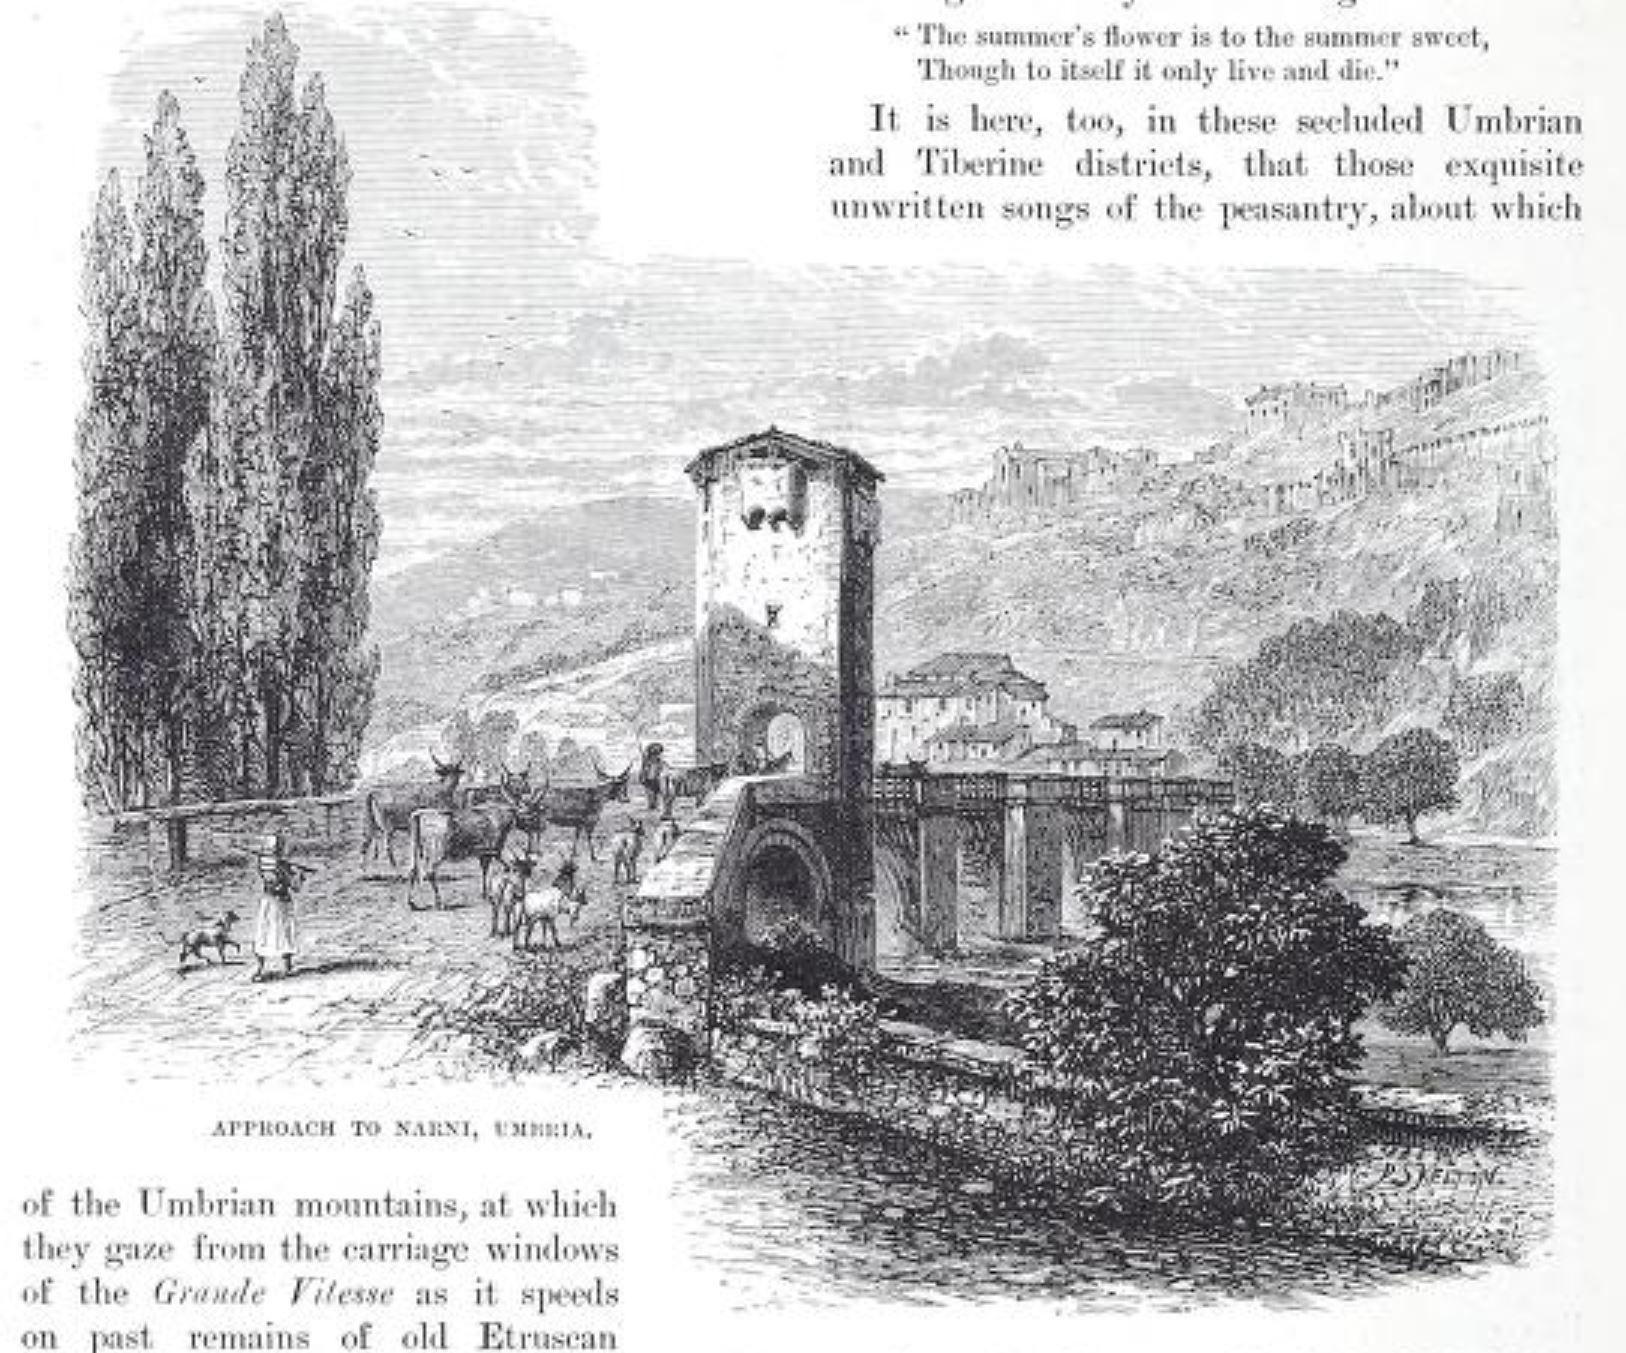 The Magazine of art 1878 London, New York, Cassell, Petter and Gallpin p 236 P S Kelton